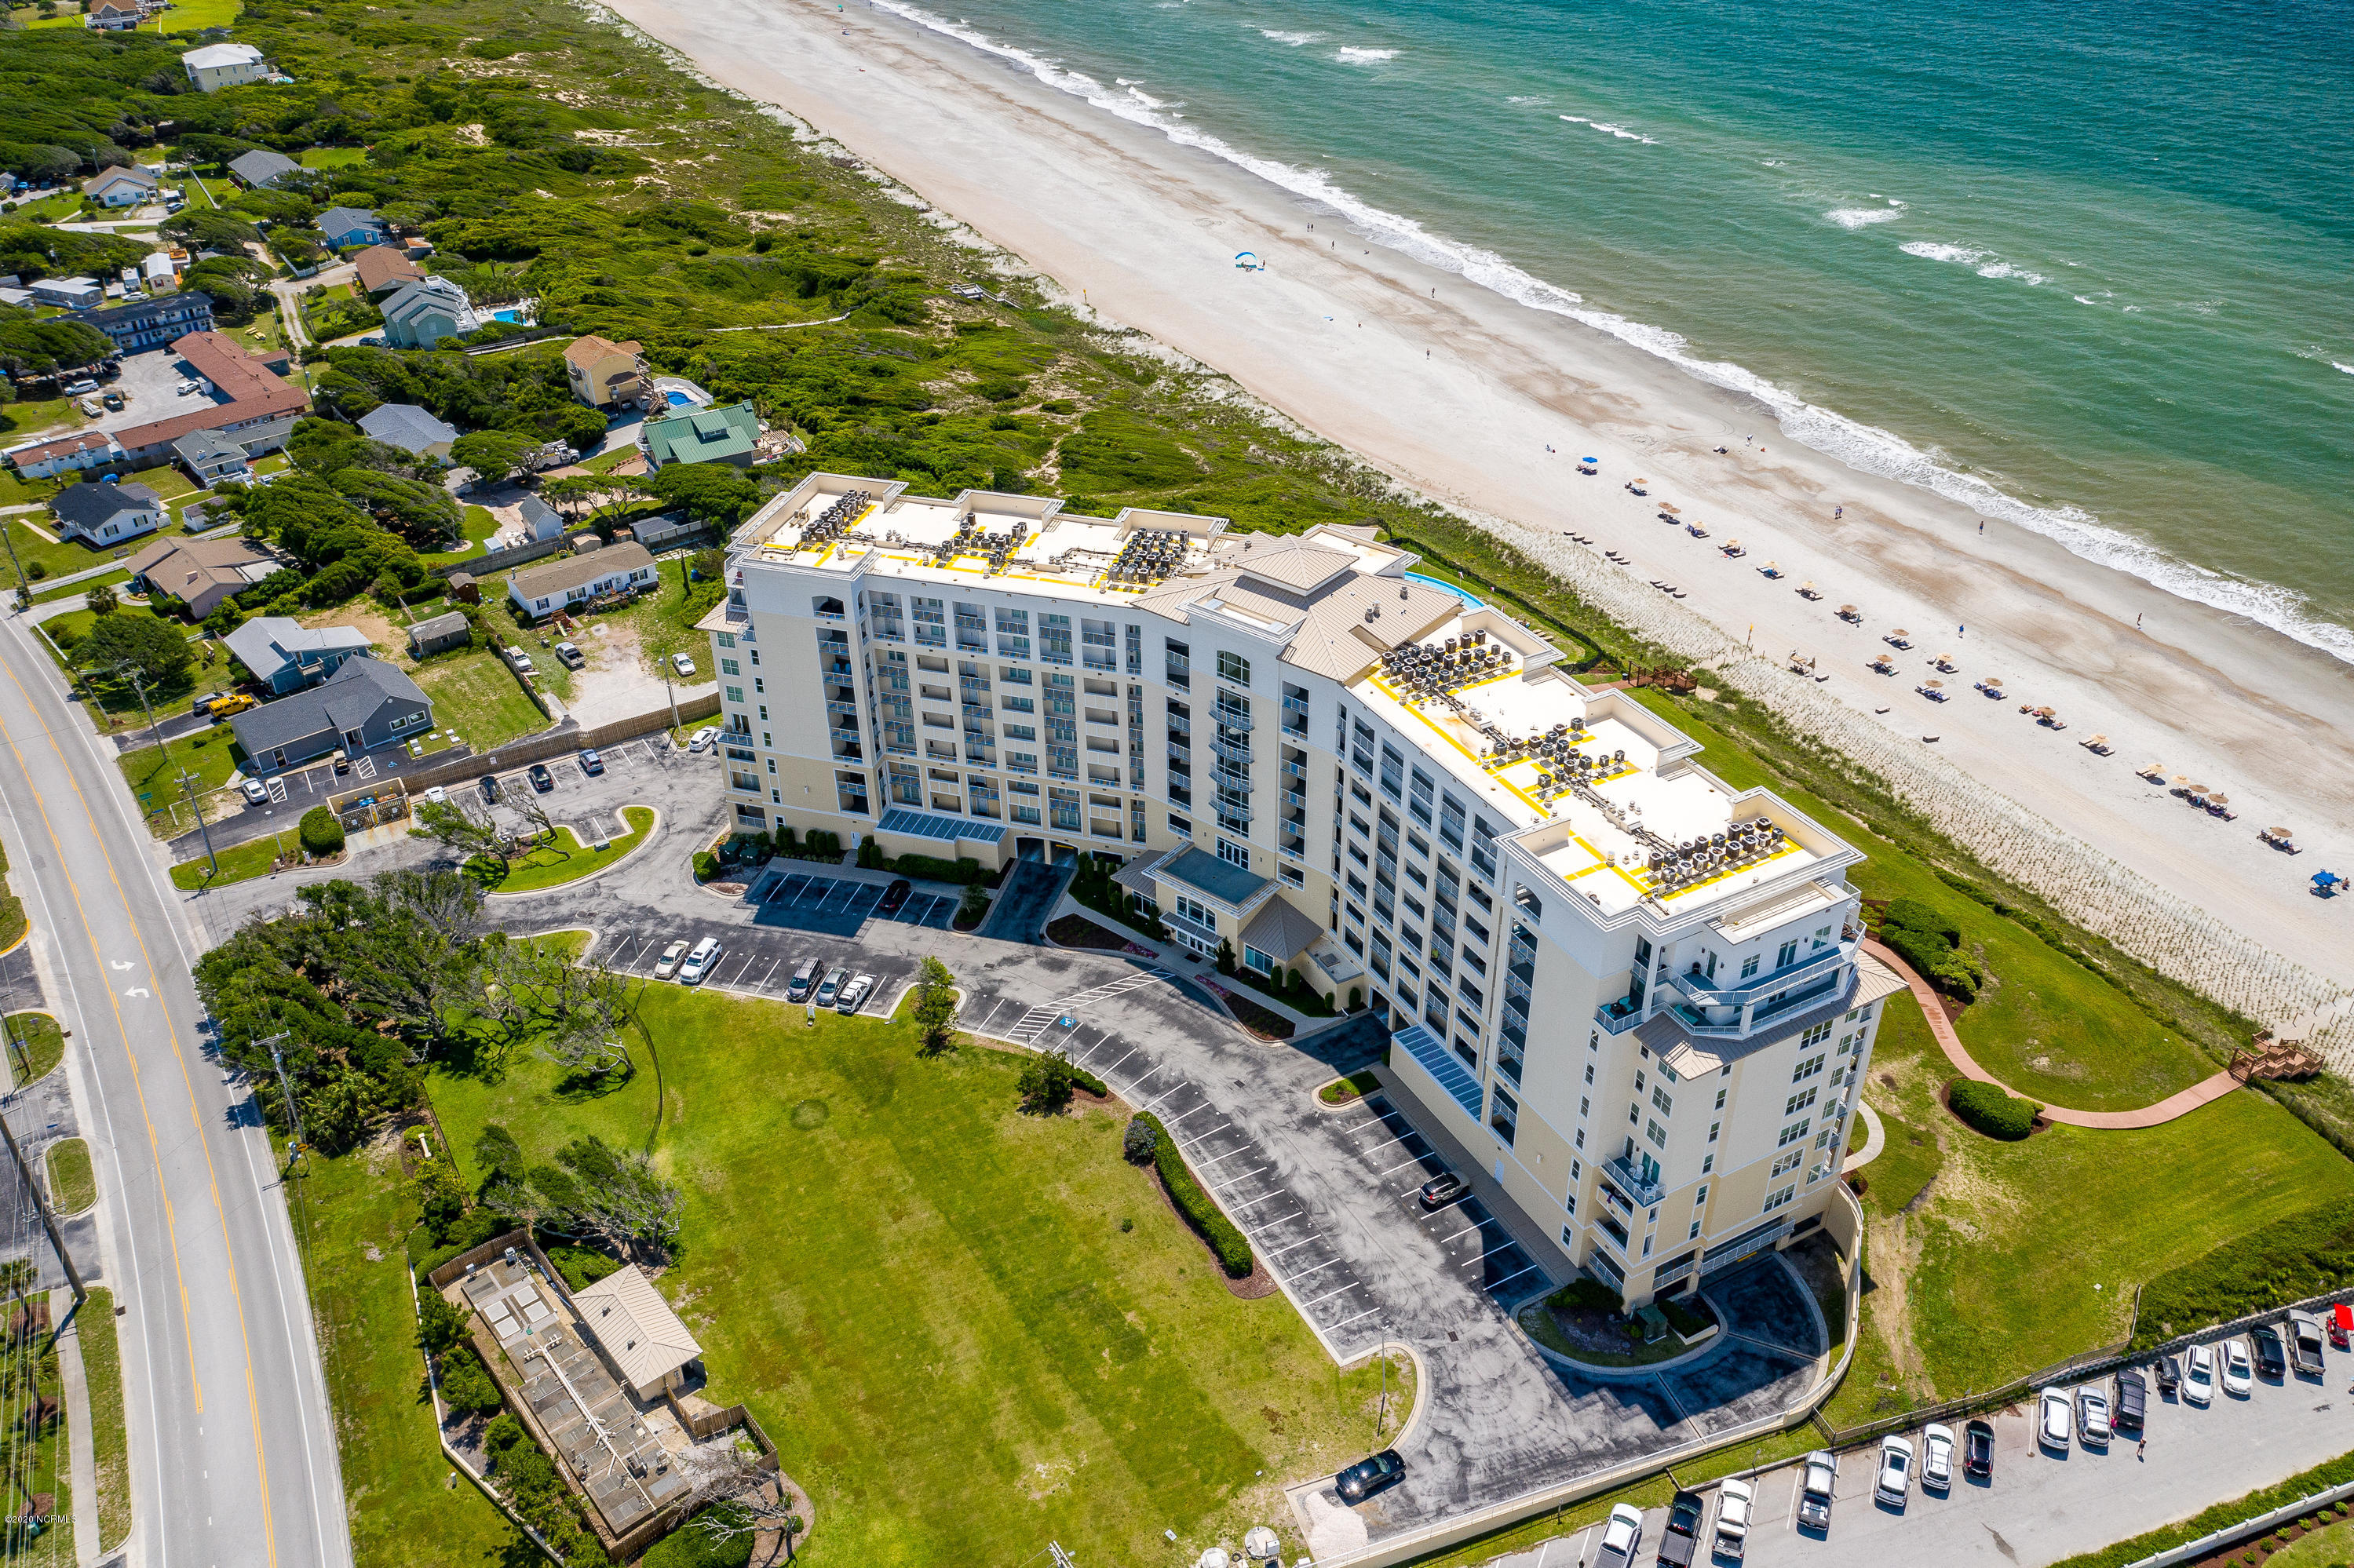 1435 Salter Path Road, Indian Beach, North Carolina 28512, 4 Bedrooms Bedrooms, 8 Rooms Rooms,4 BathroomsBathrooms,Condominium,For sale,Salter Path,100223815